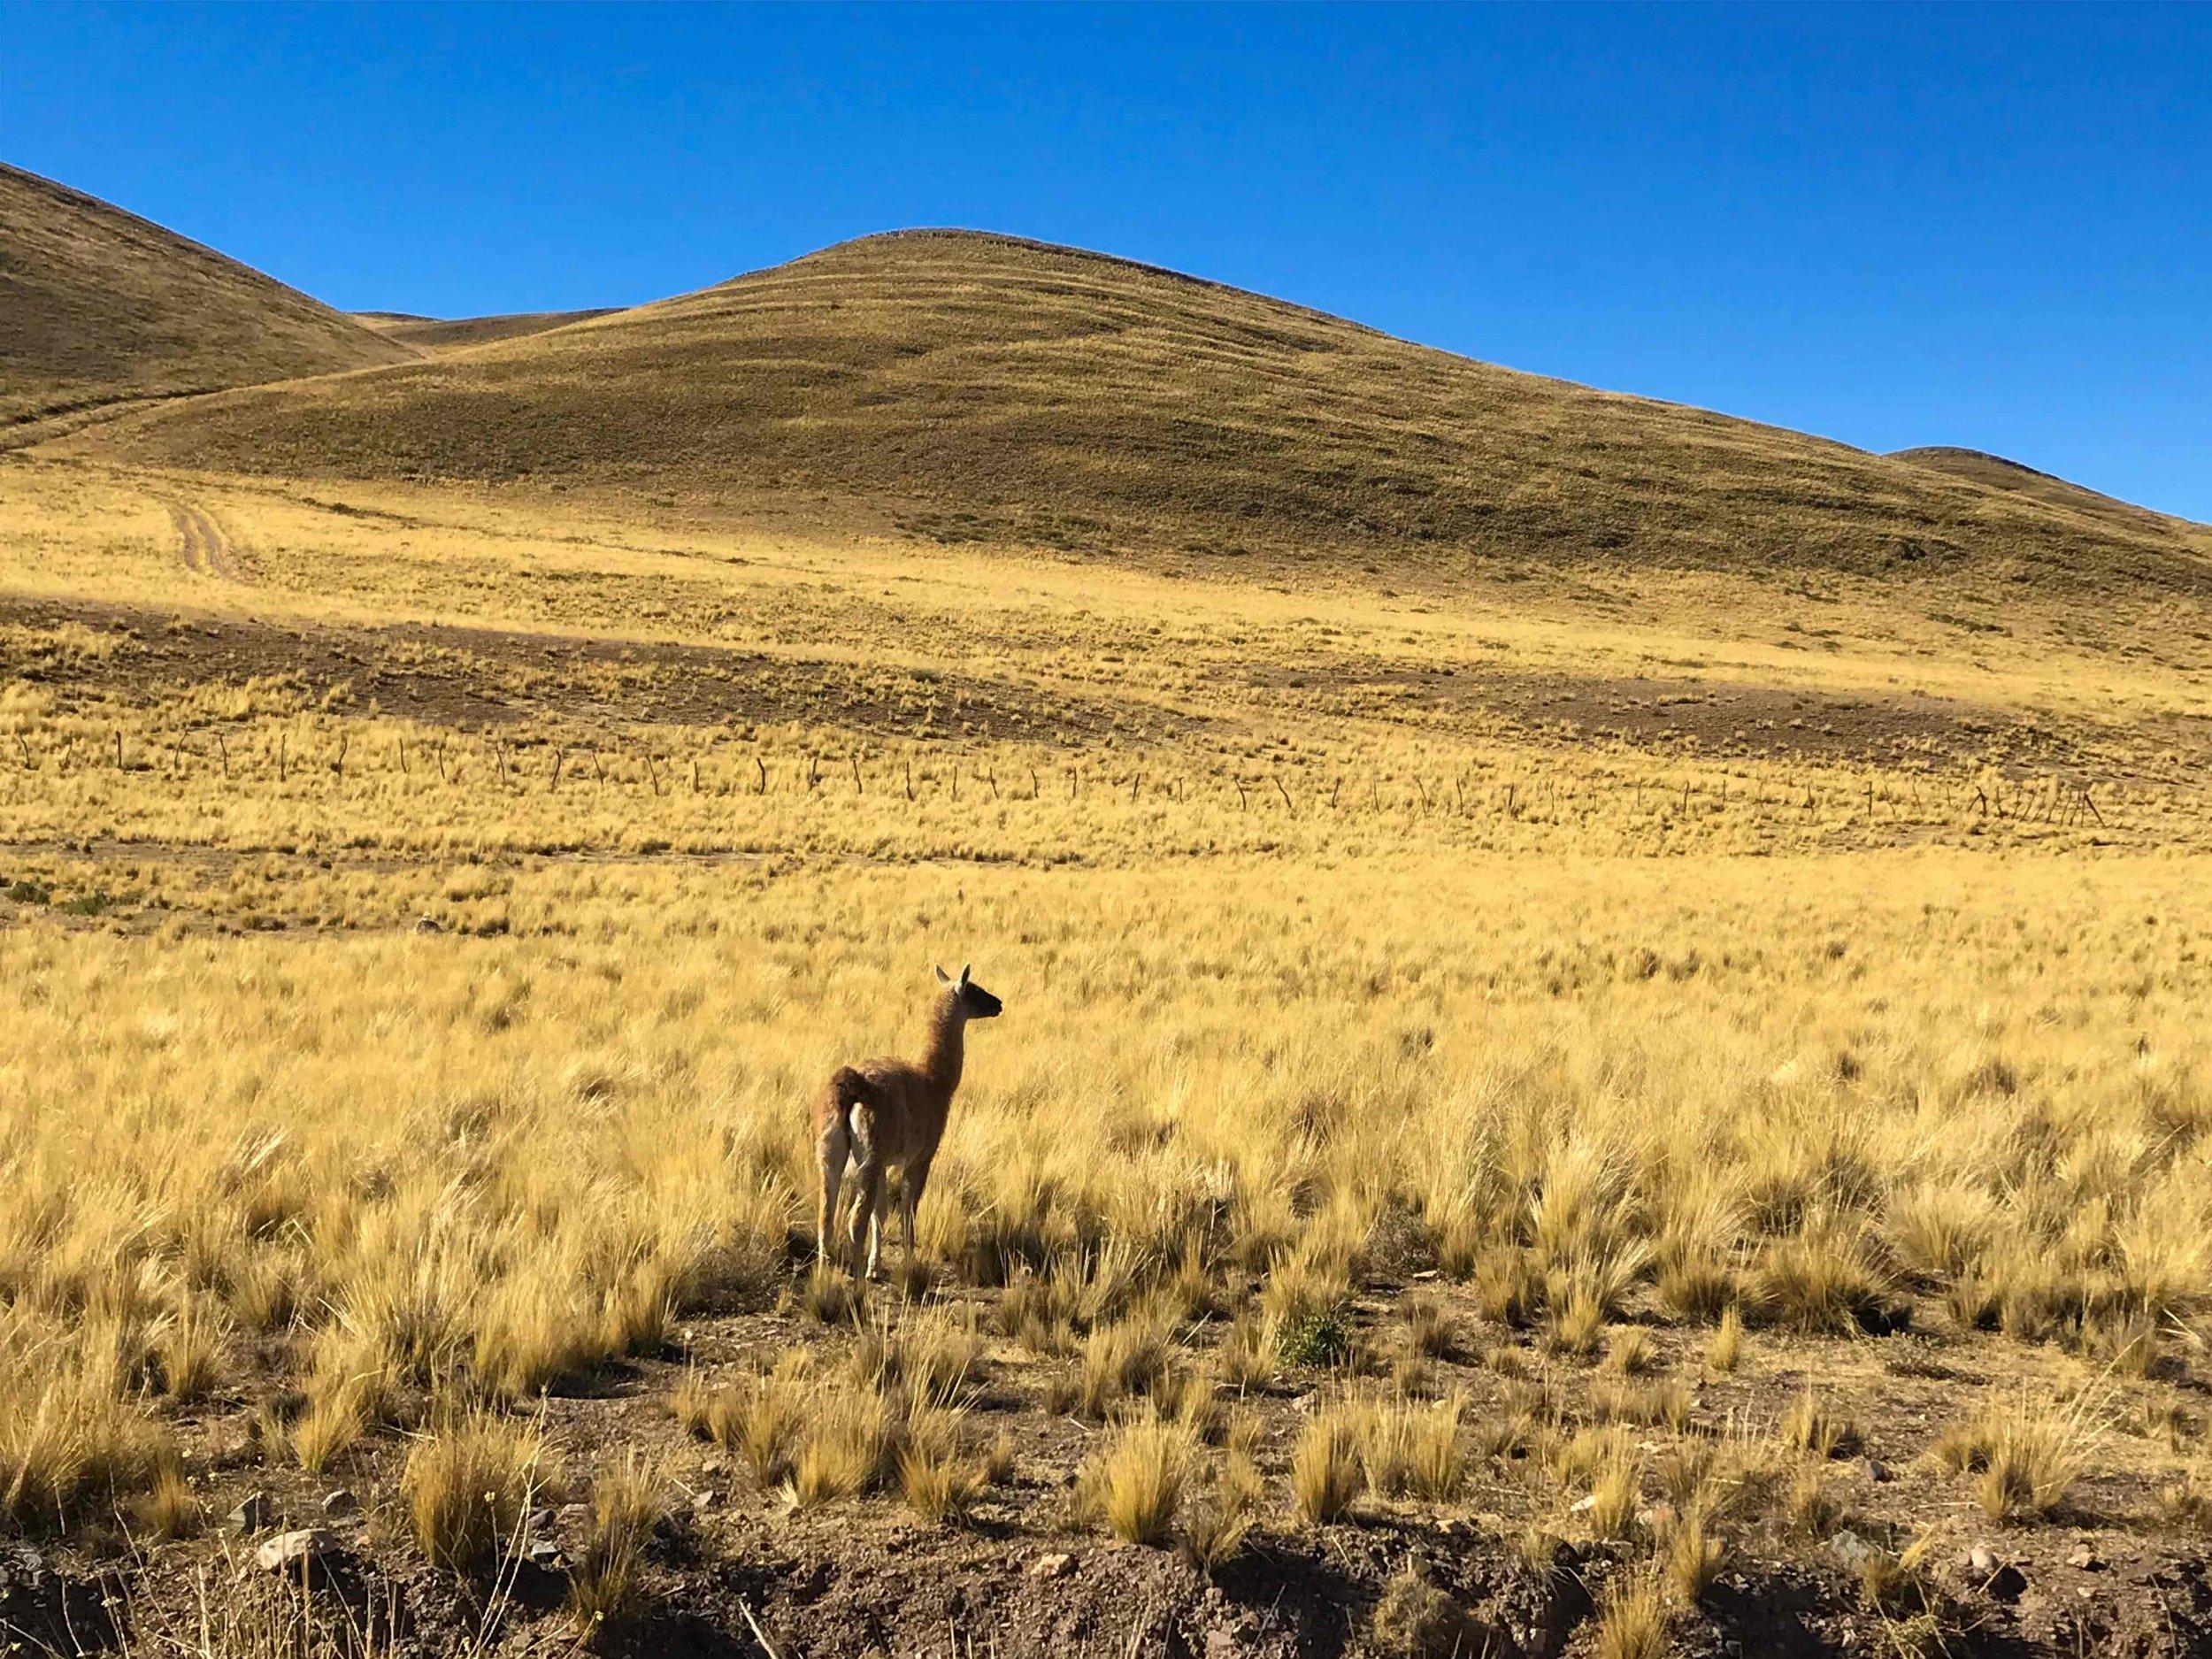 Llama along the Tin Tin Straight Line in Los Cardones National Park, Argentina.